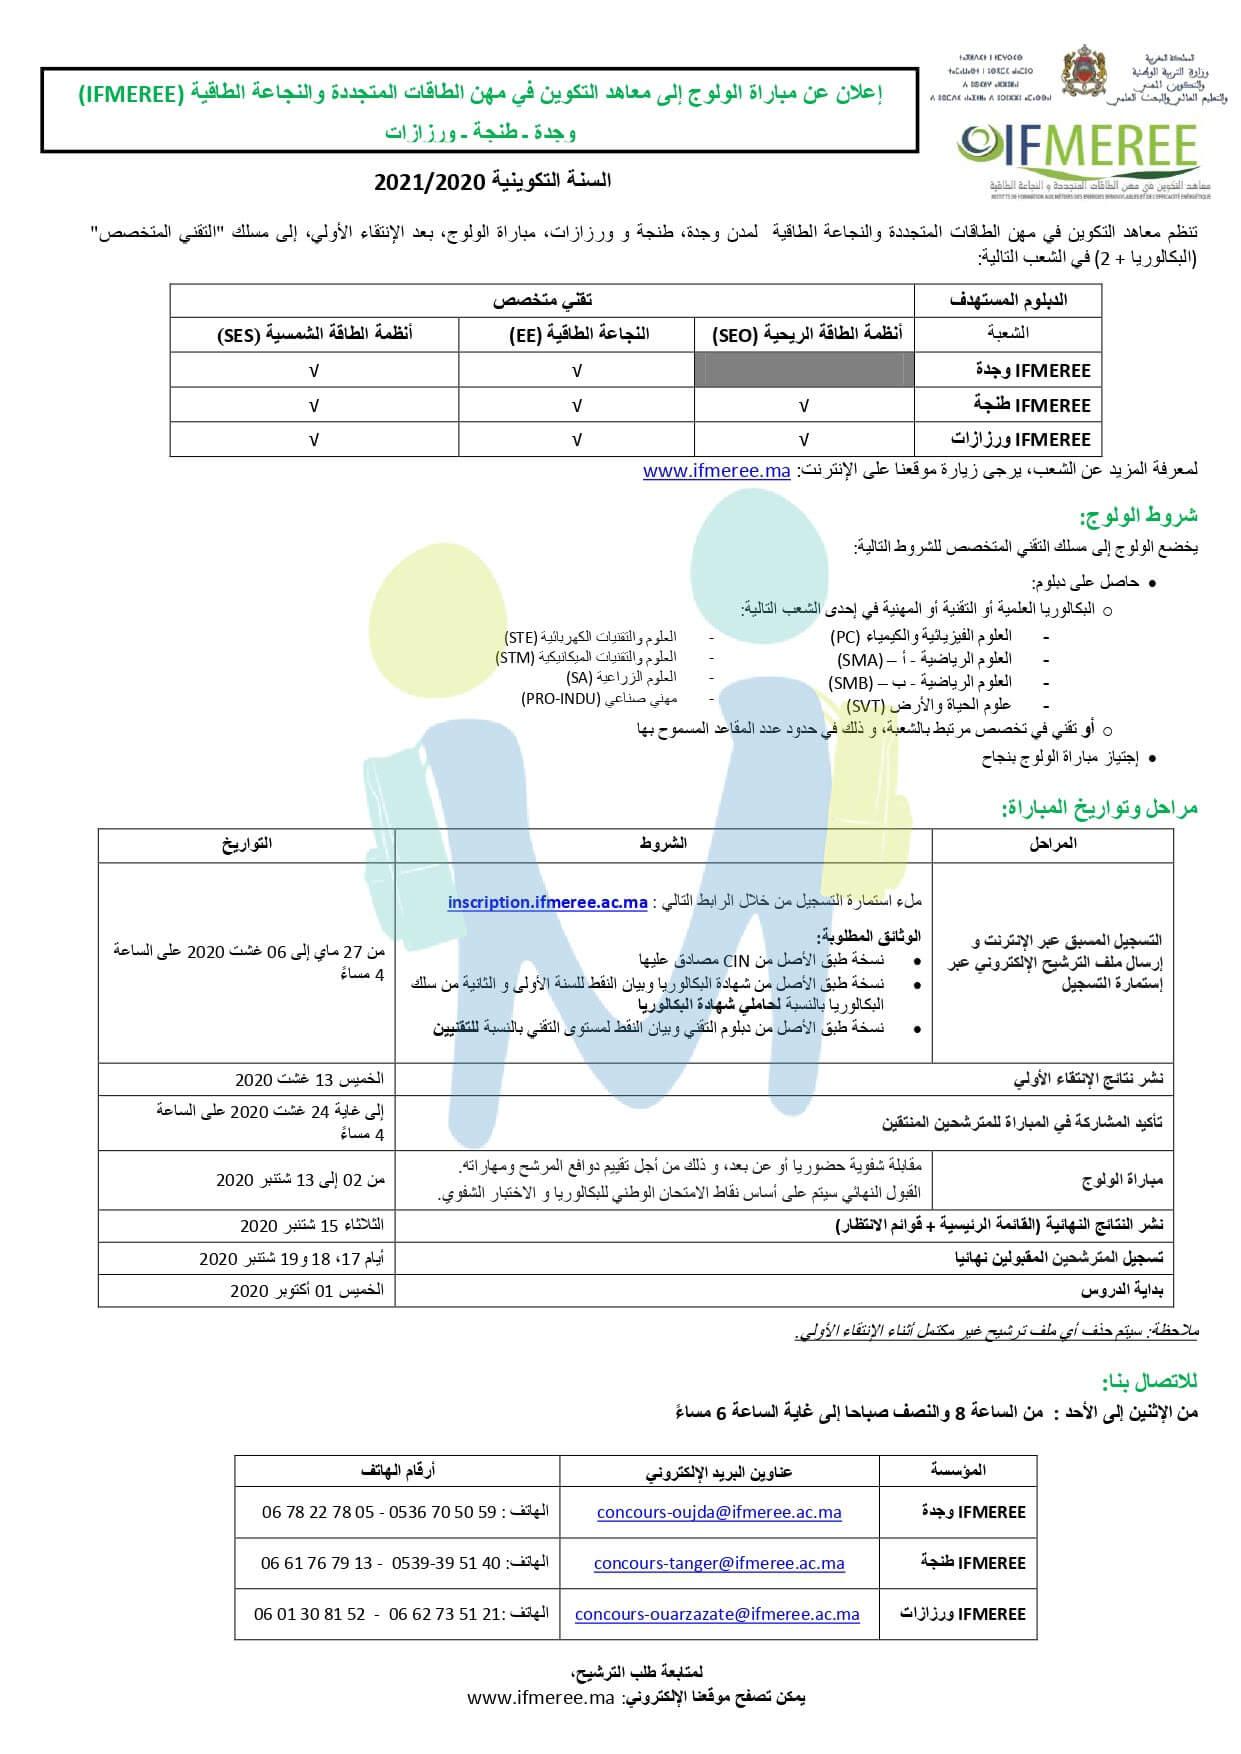 Inscription Concours IFMEREE 2020-2021